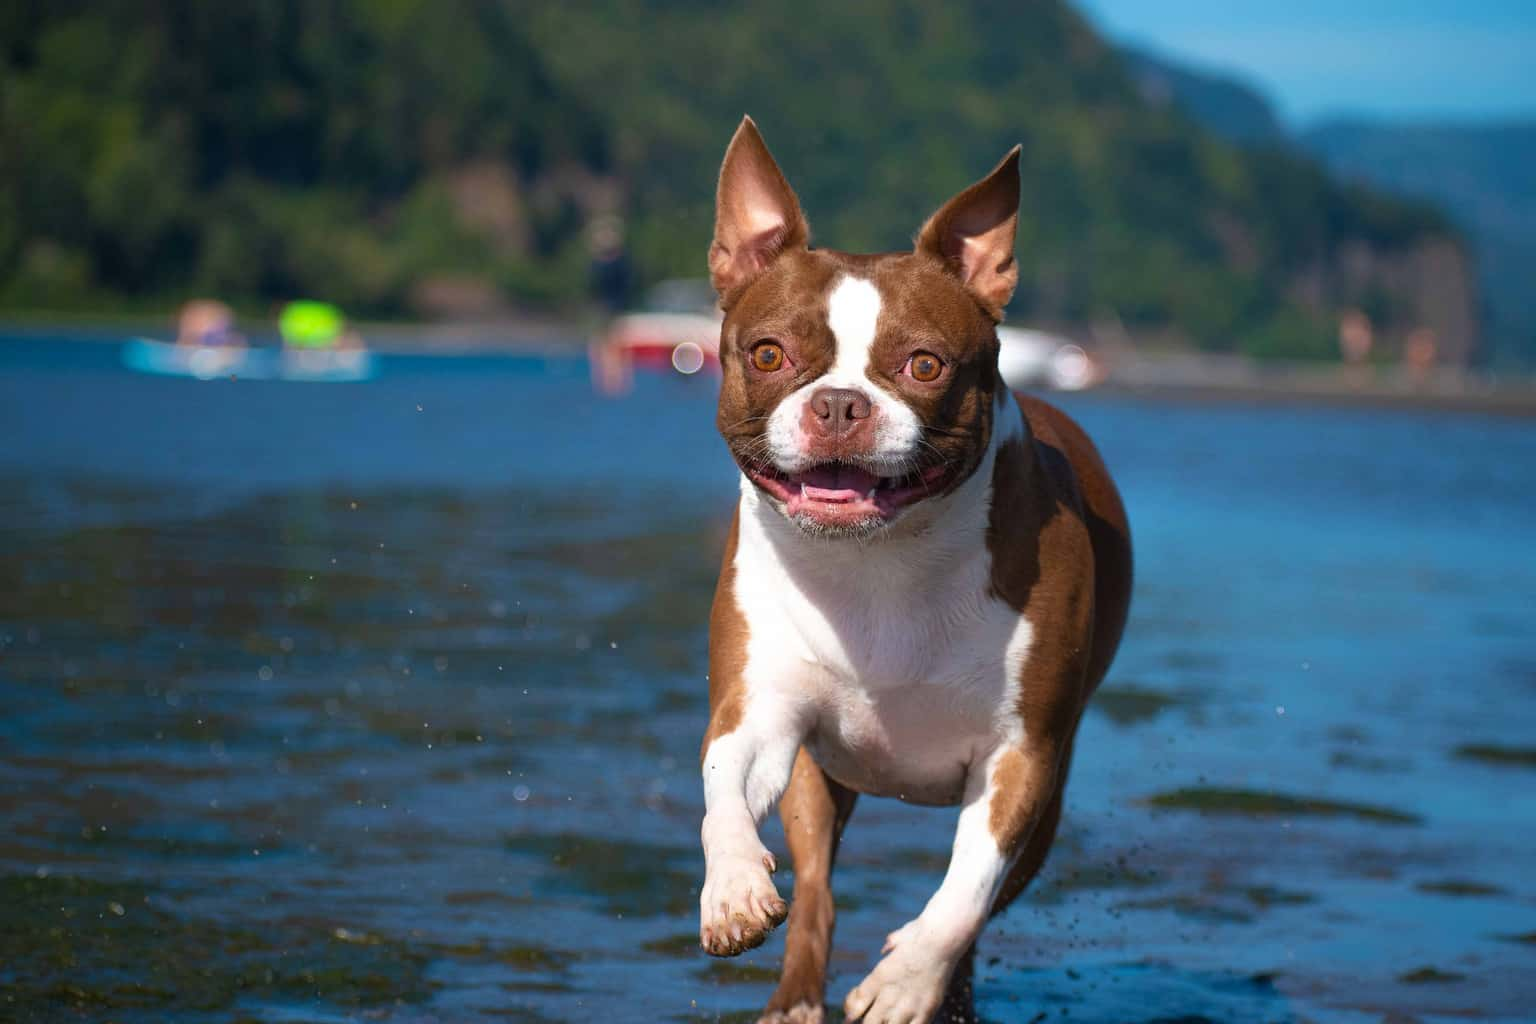 Dog running in a beach